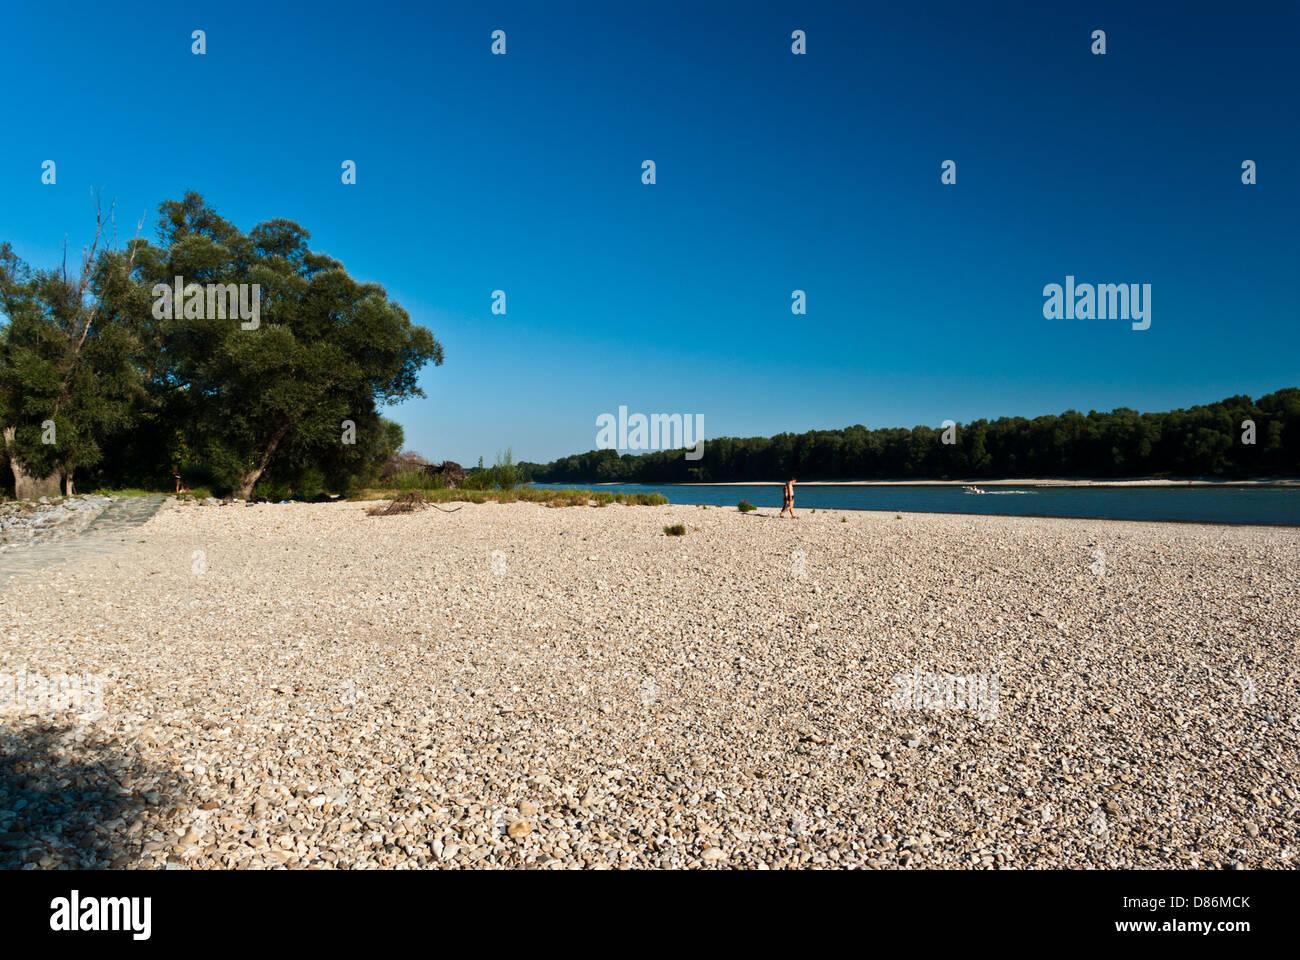 Stony beach at Danube river bank, 20km downstream from Vienna Stock Photo